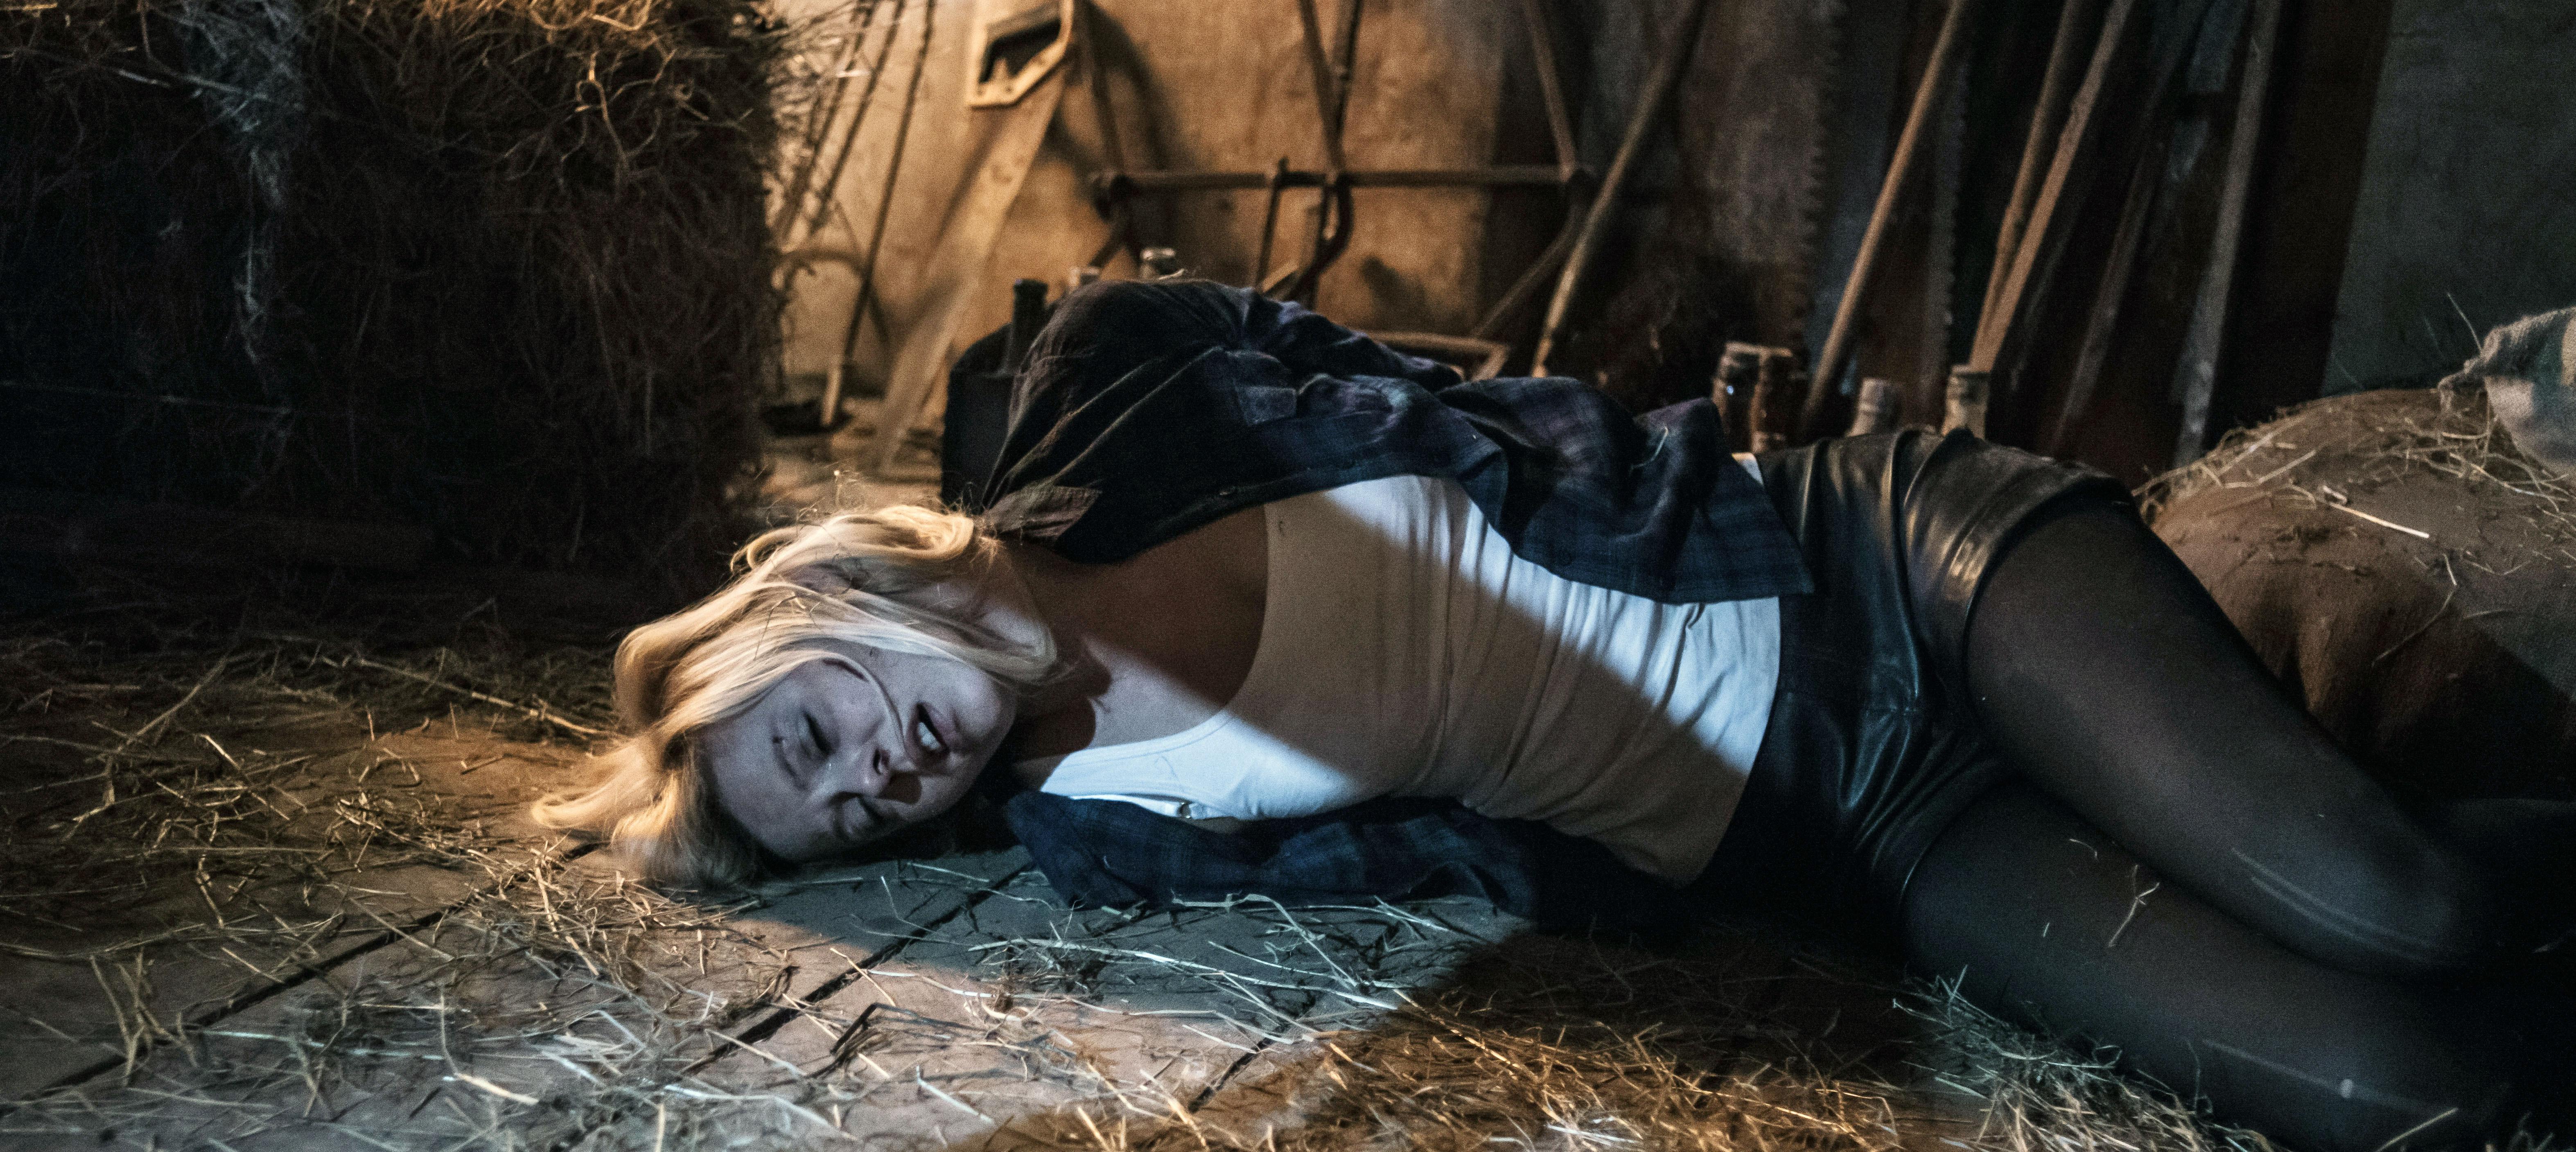 Movie girl murdered cornfield ghost — photo 4